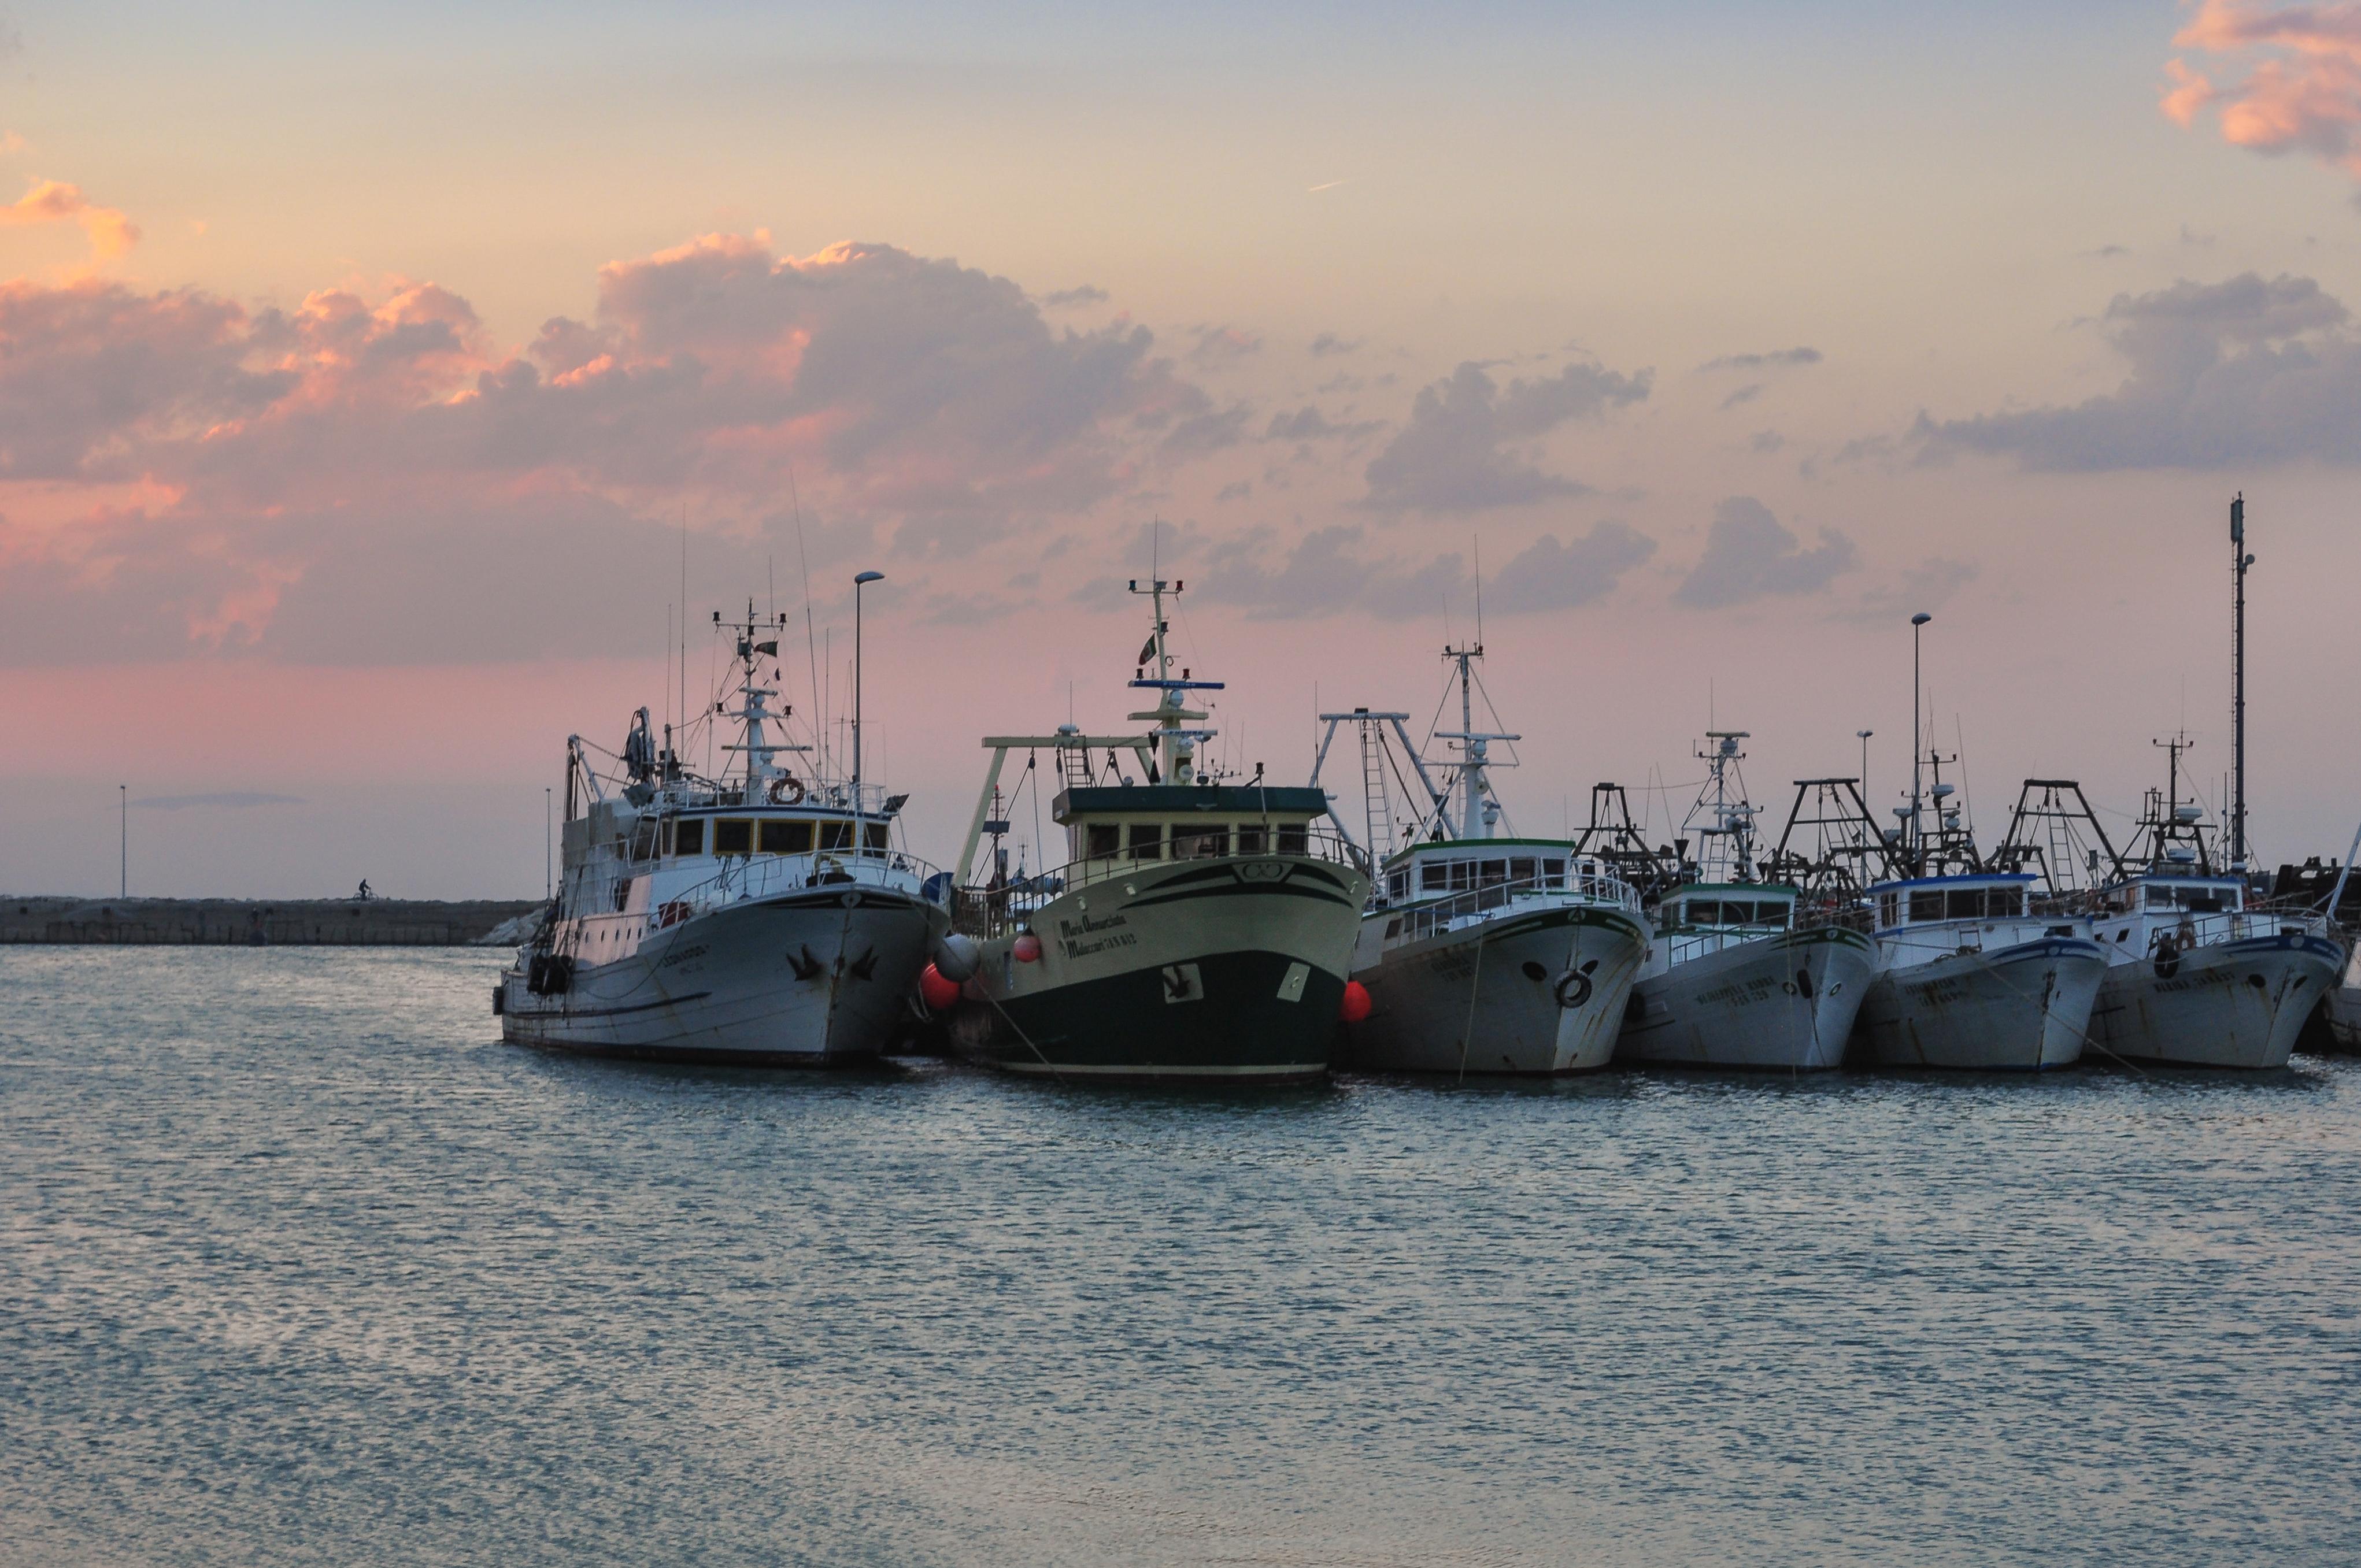 Italian Harbour, Boats, Harbour, Italian, Italy, HQ Photo